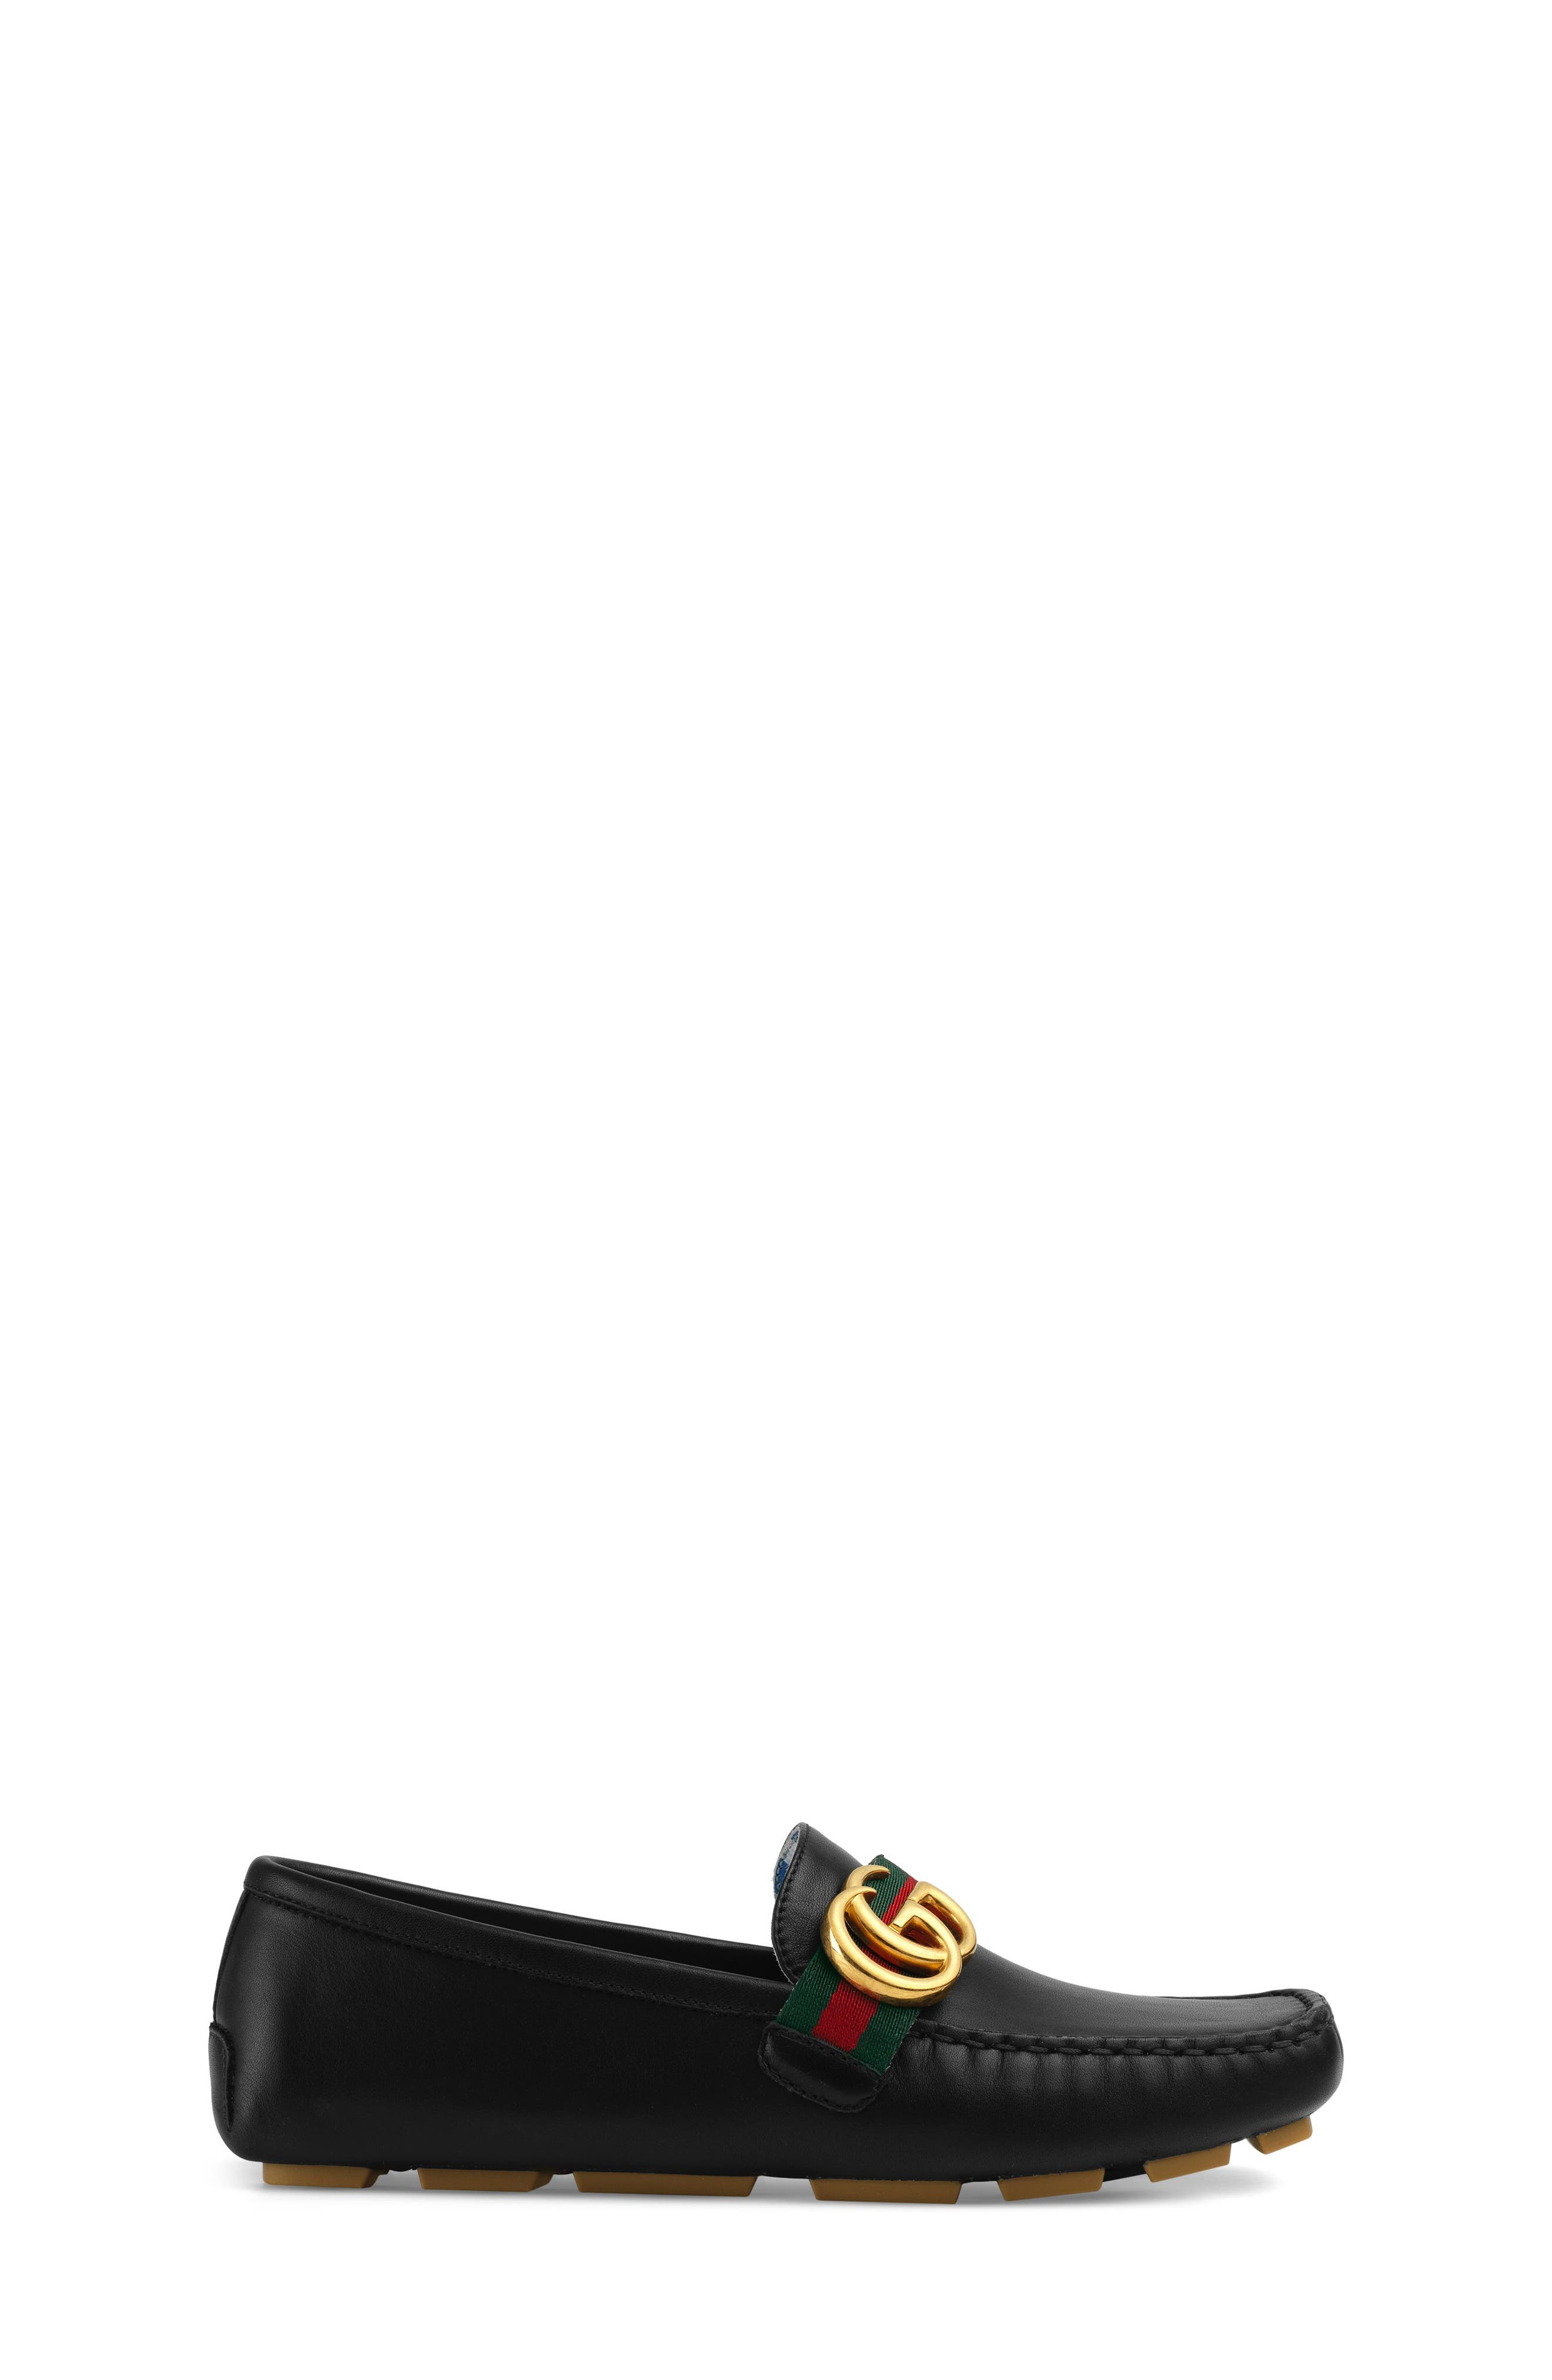 GUCCI, Noel Driving Loafer, Alternate thumbnail 3, color, BLACK